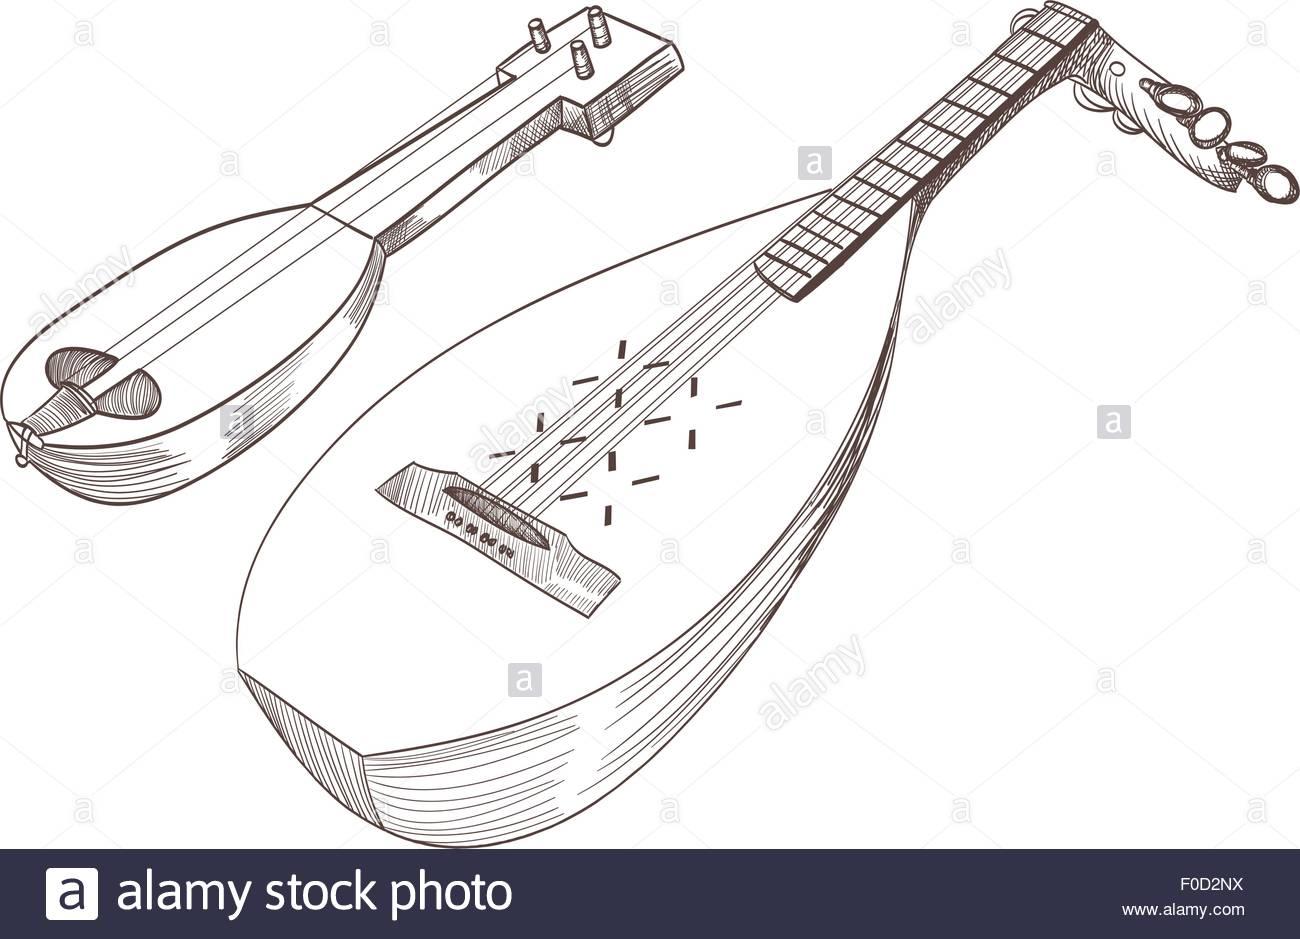 1300x939 Cobza Musical Stringed Instruments Drawing Stock Vector Art